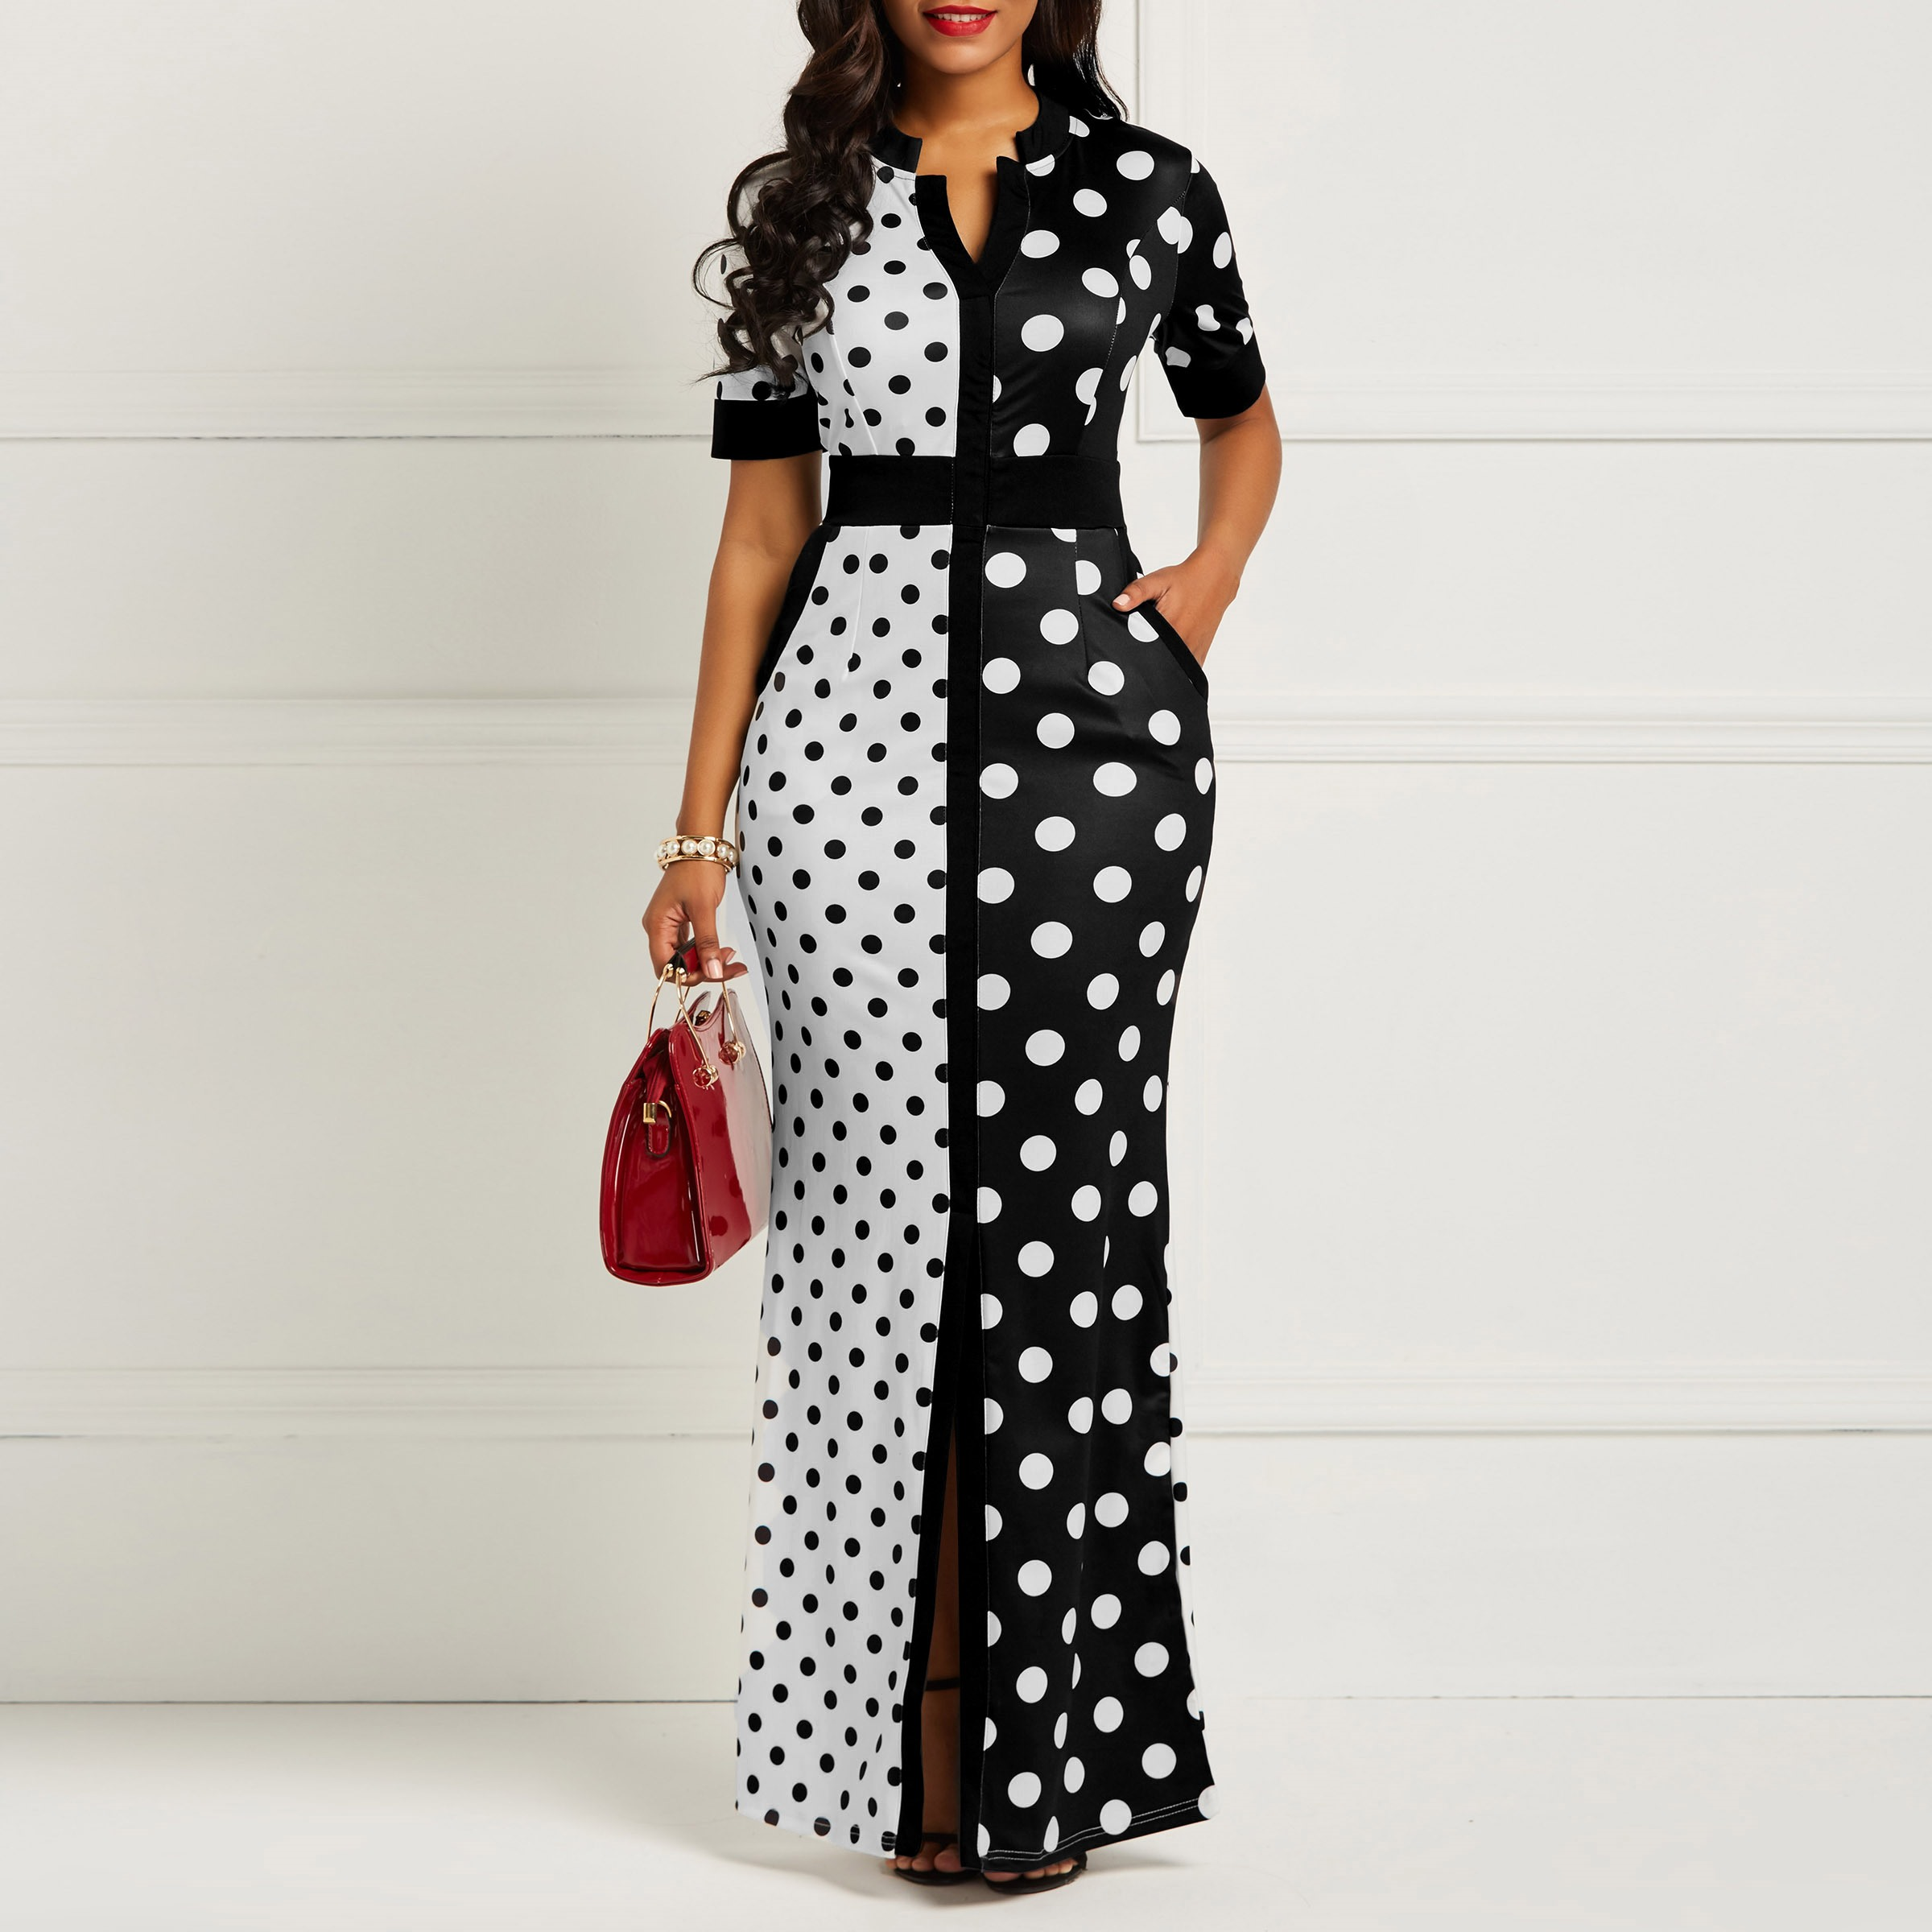 Clocolor African Dress Vintage Polka Dot White Black Printed Retro Bodycon Women Summer Short Sleeve Plus Size Long Maxi Dress